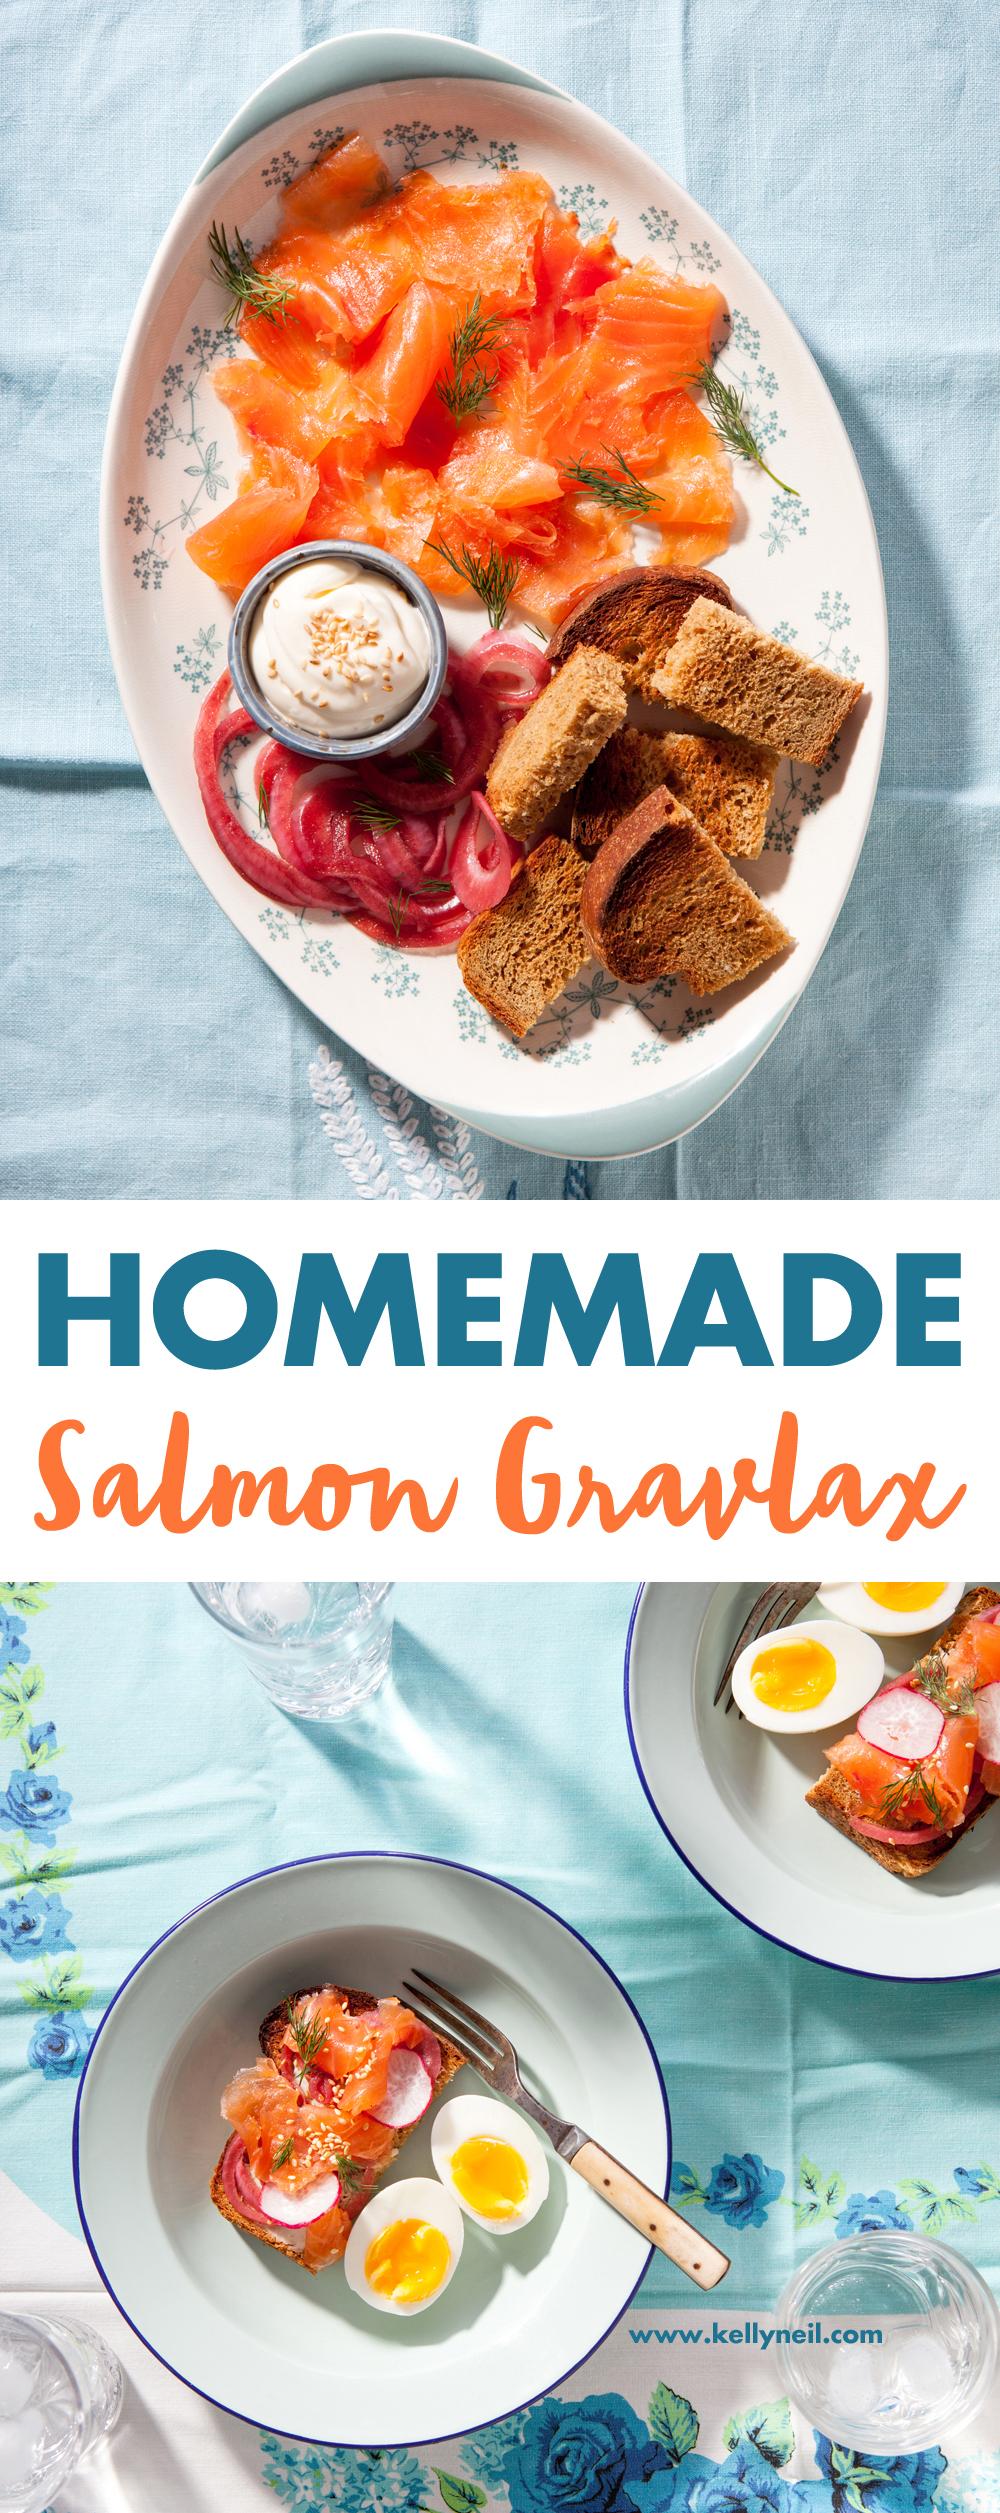 Homemade Salmon Gravlax Recipe